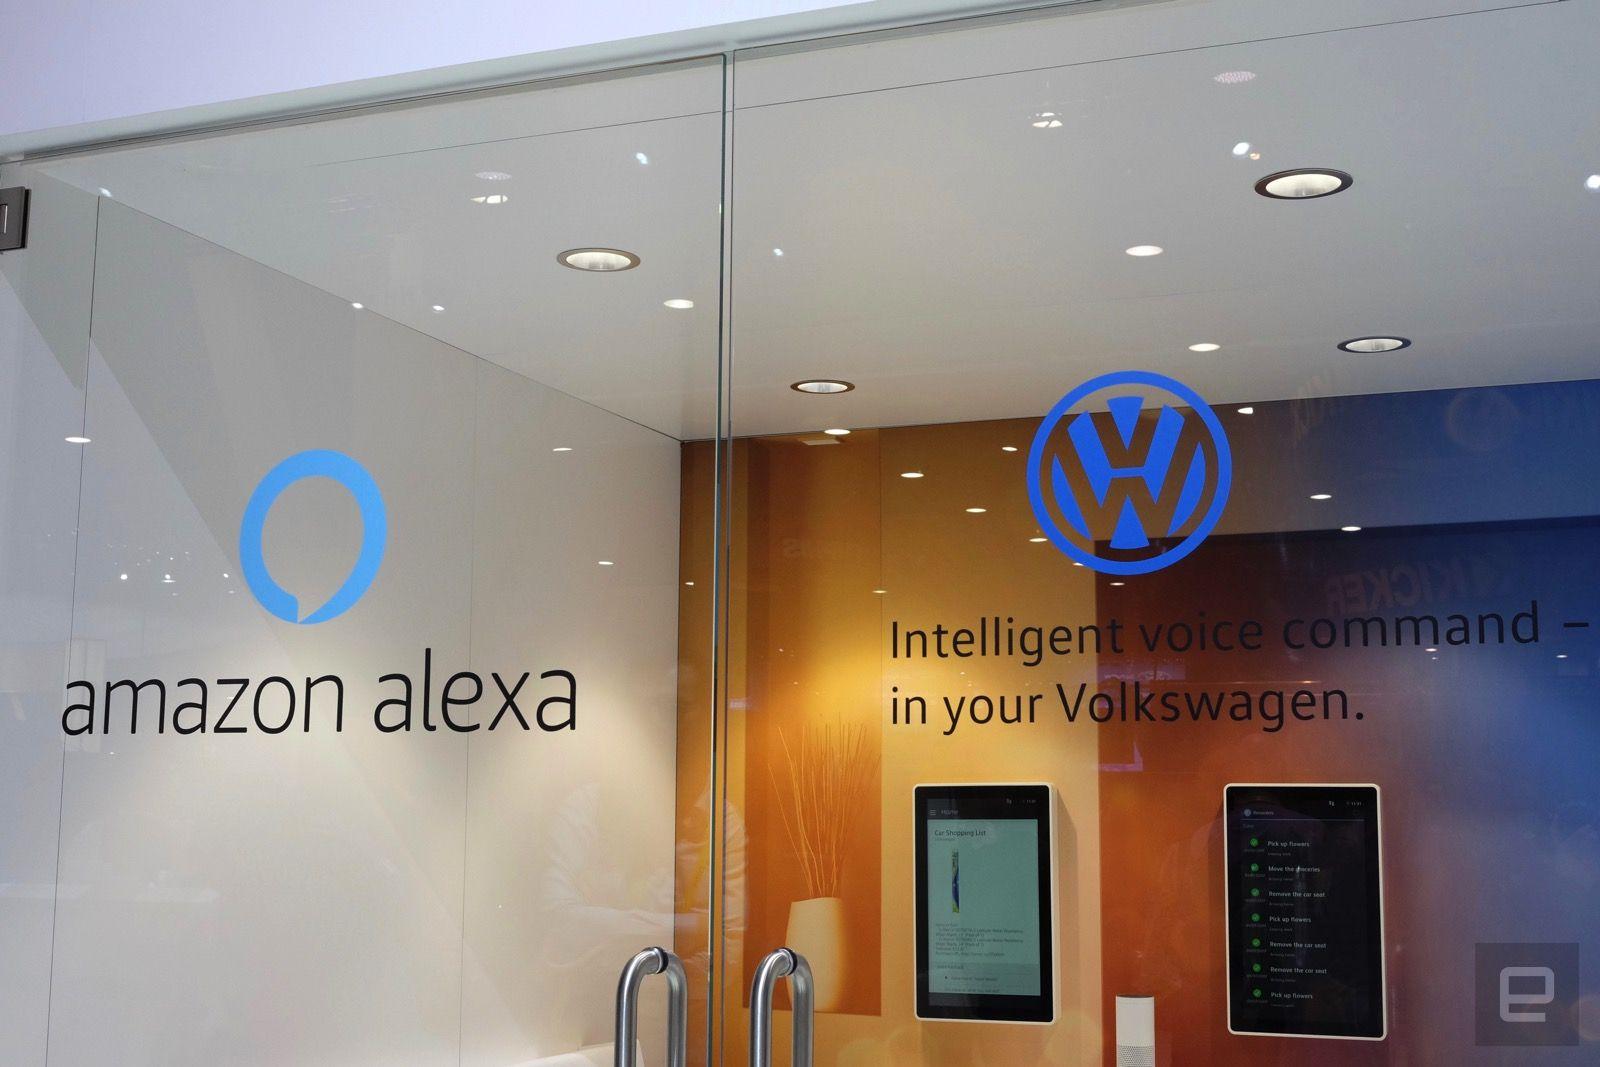 Volkwagen is adding Amazon Alexa to its cars